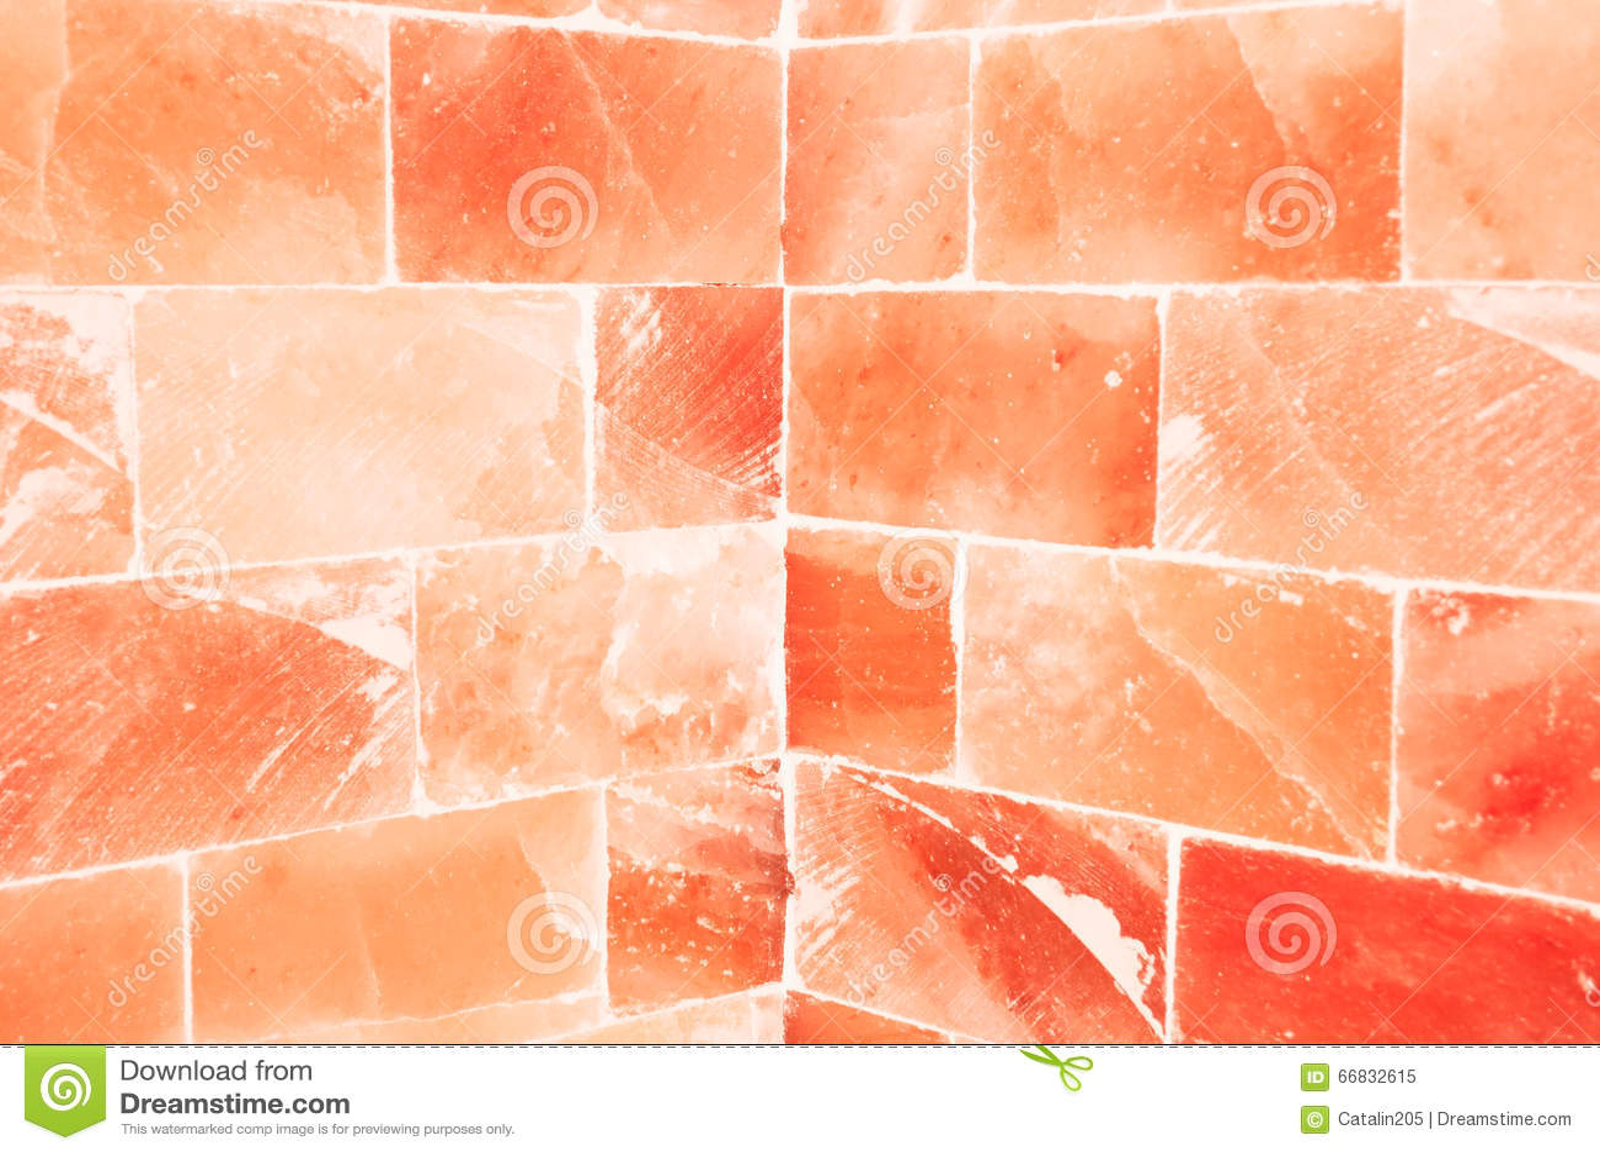 Close-up of orange salty wall inside sauna room